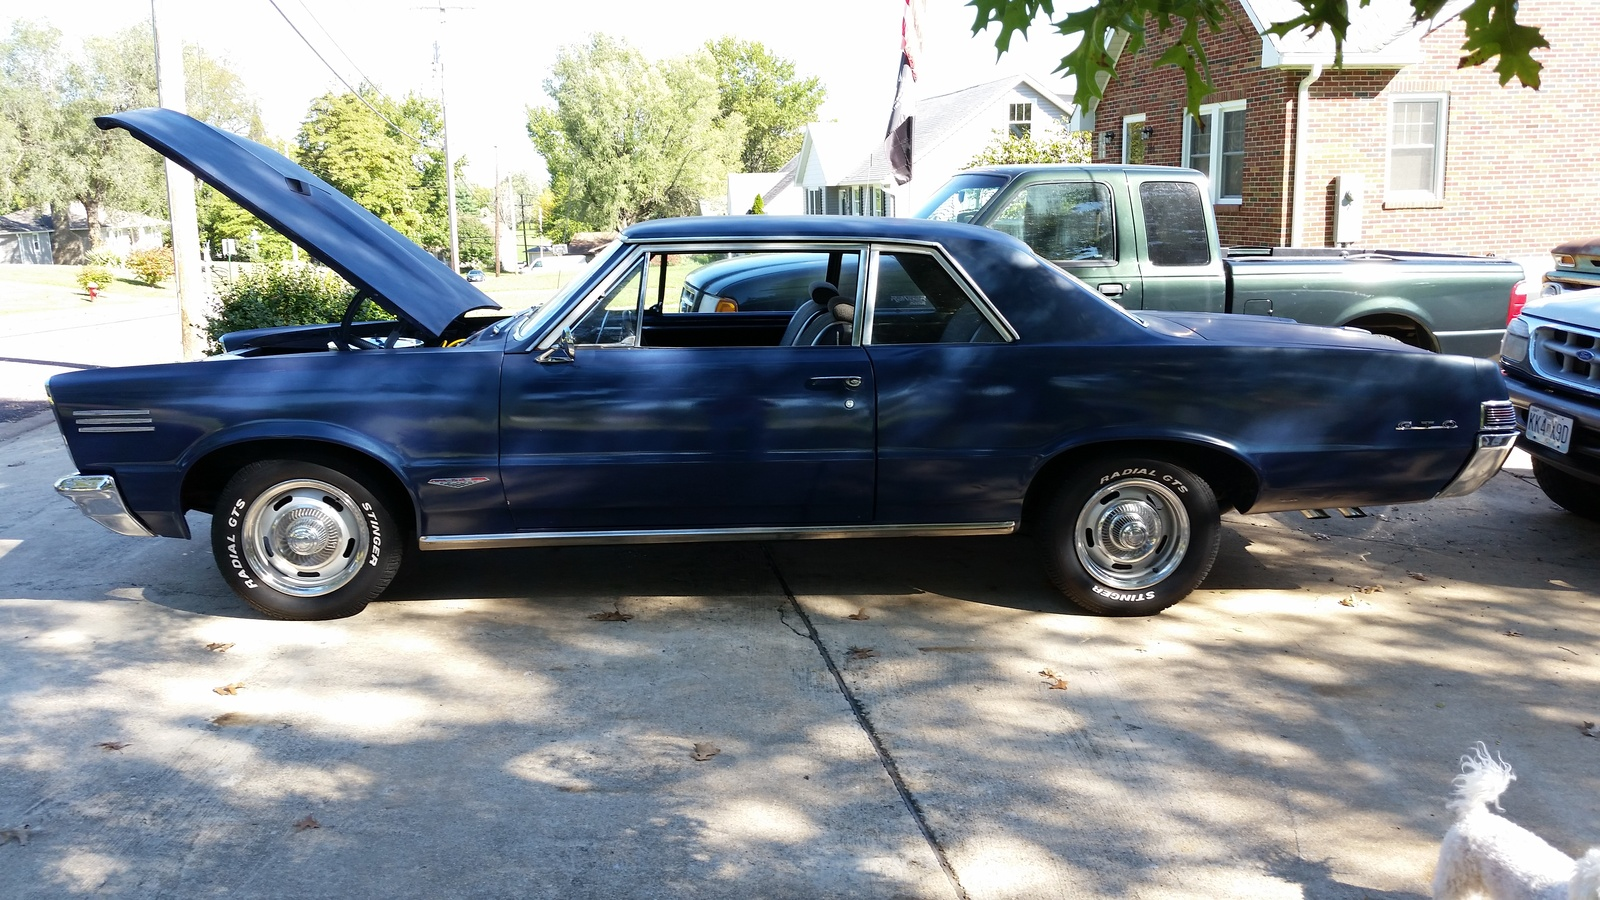 Pontiac GTO Questions - what is my car worth - CarGurus